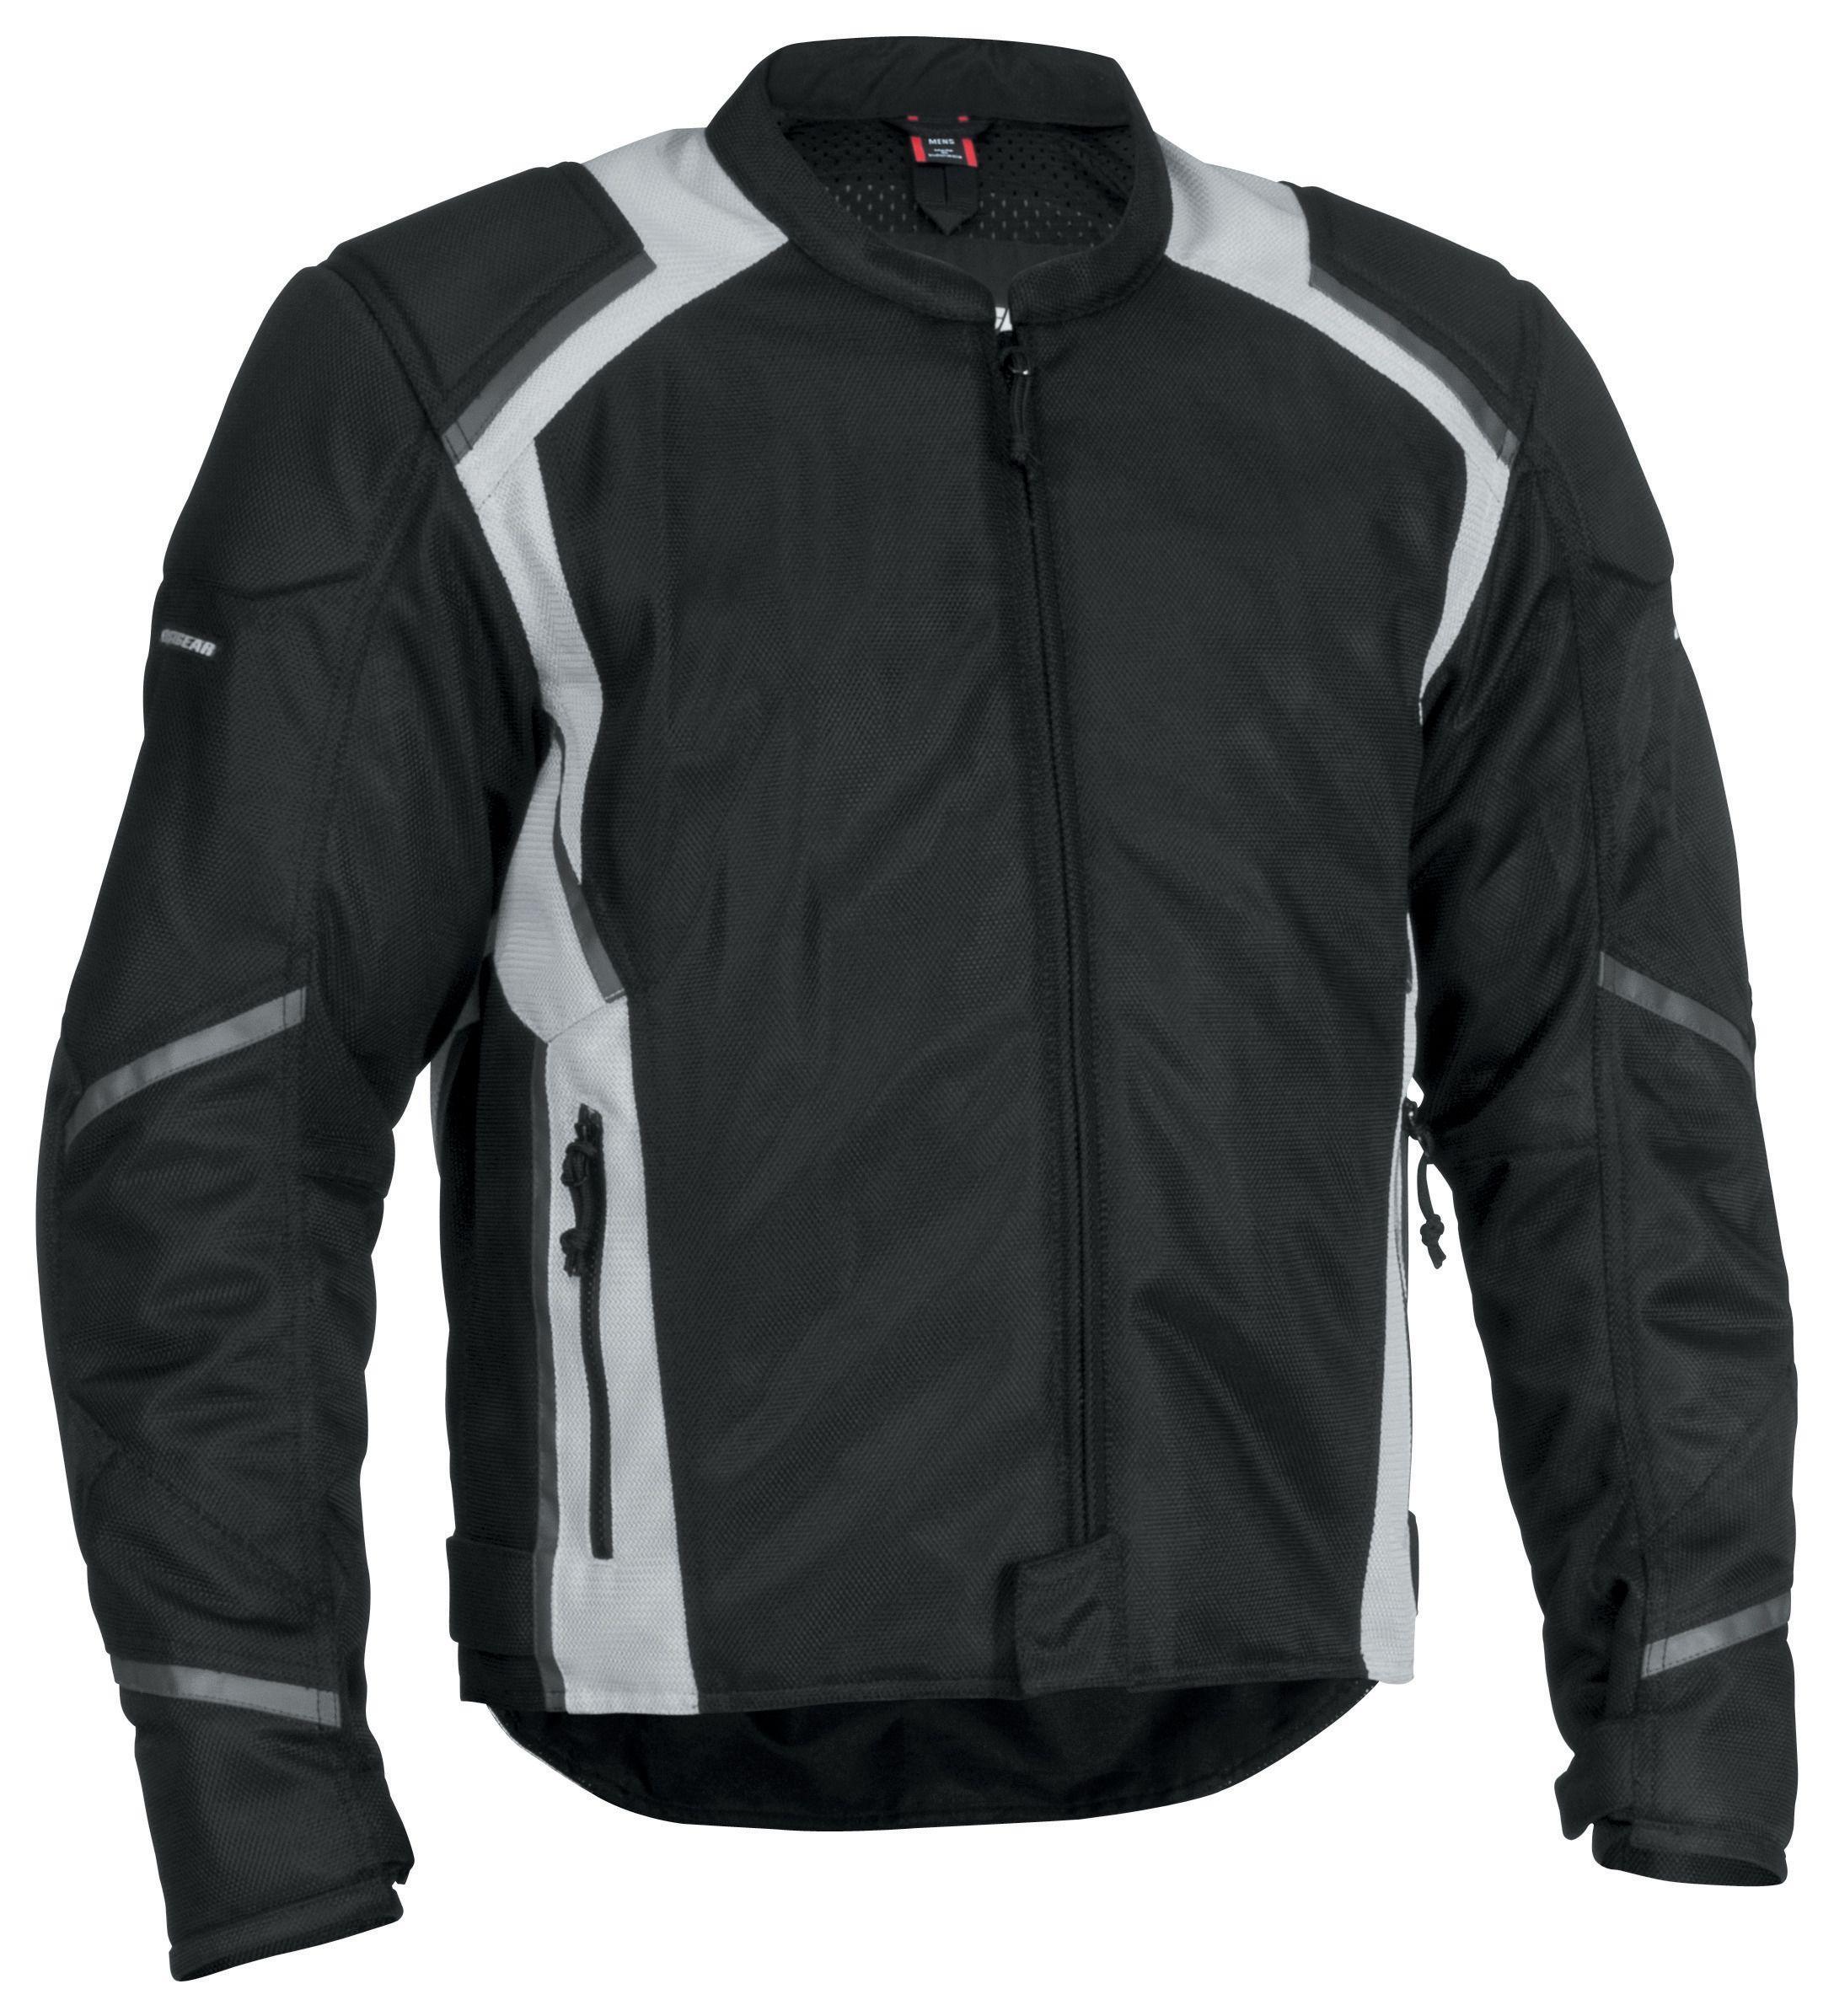 Tall Motorcycle Jacket